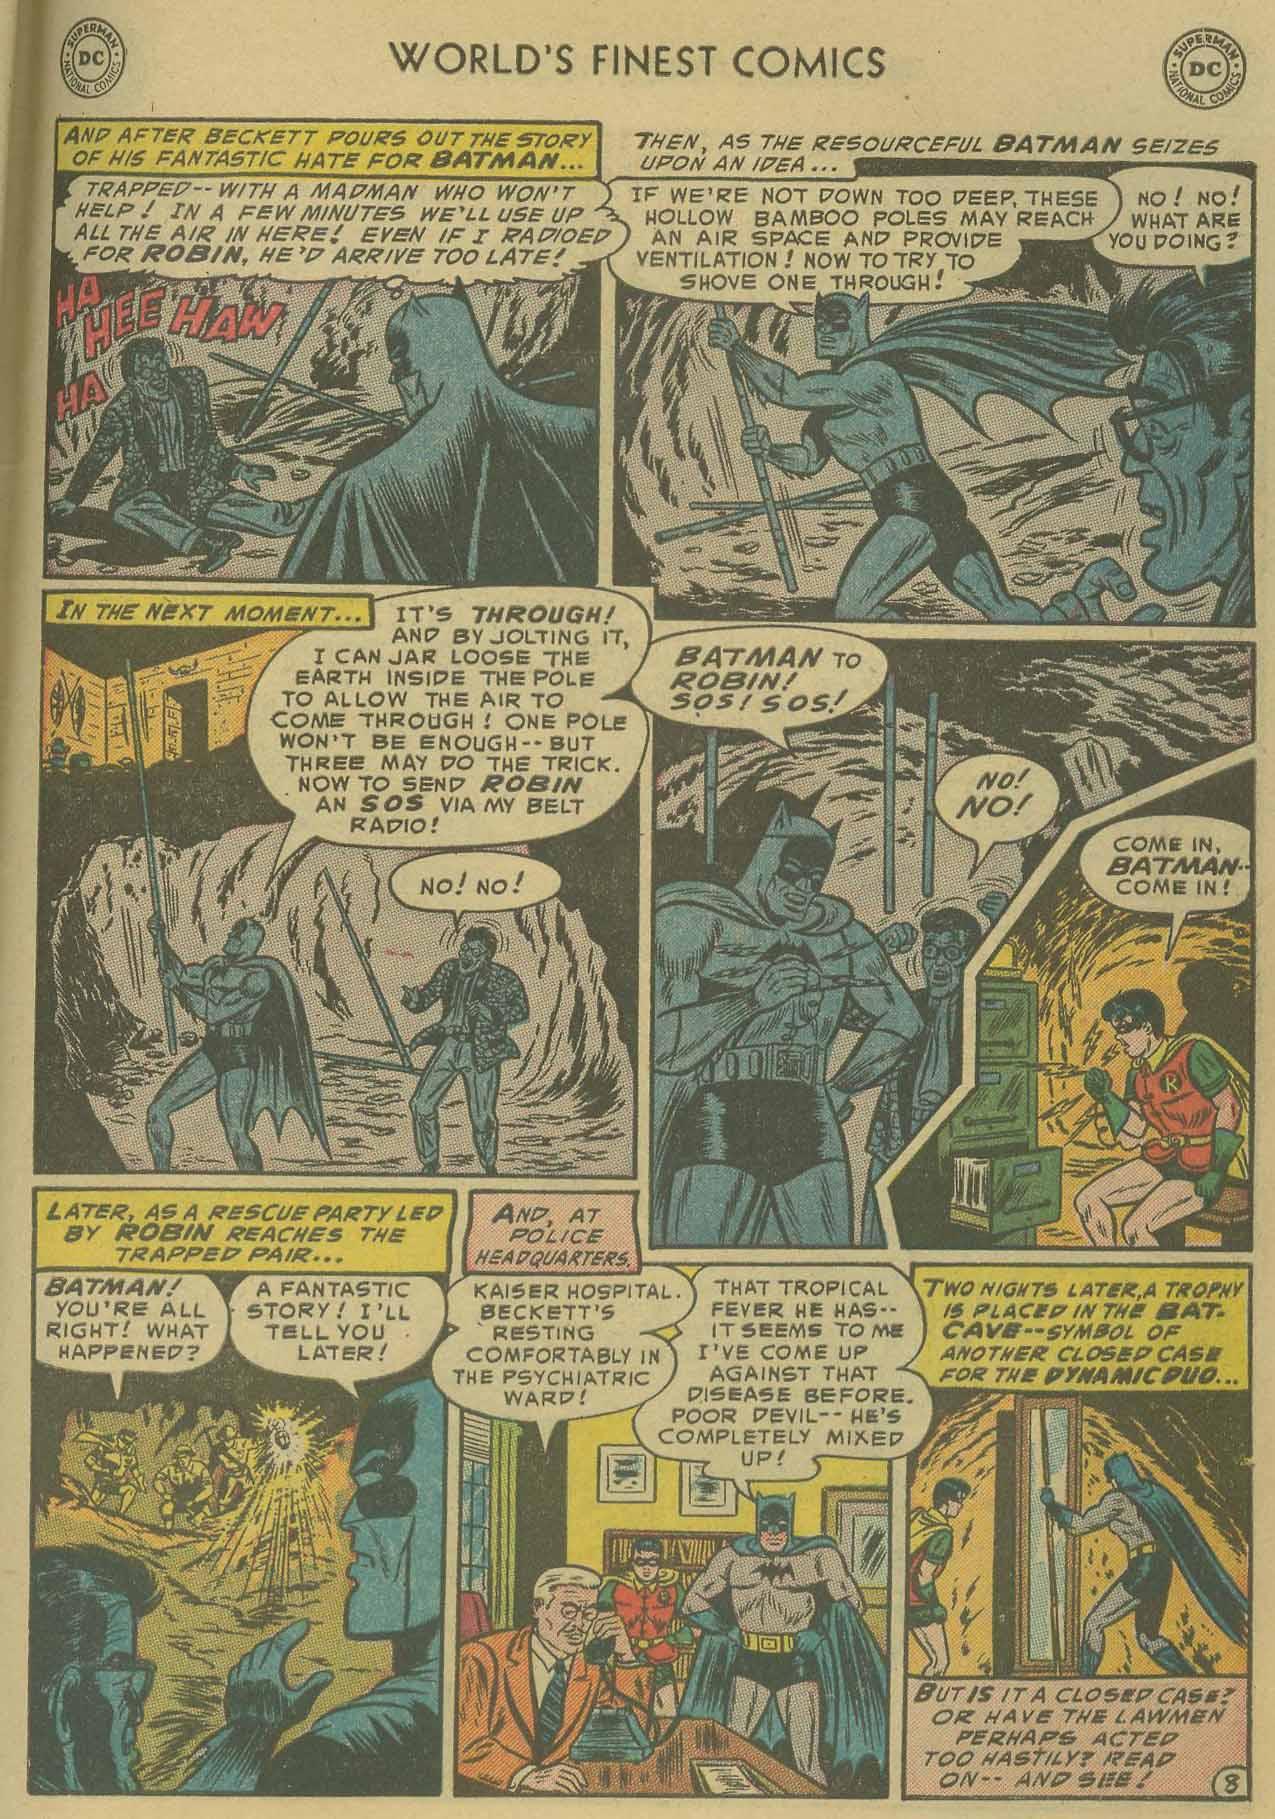 Read online World's Finest Comics comic -  Issue #69 - 61